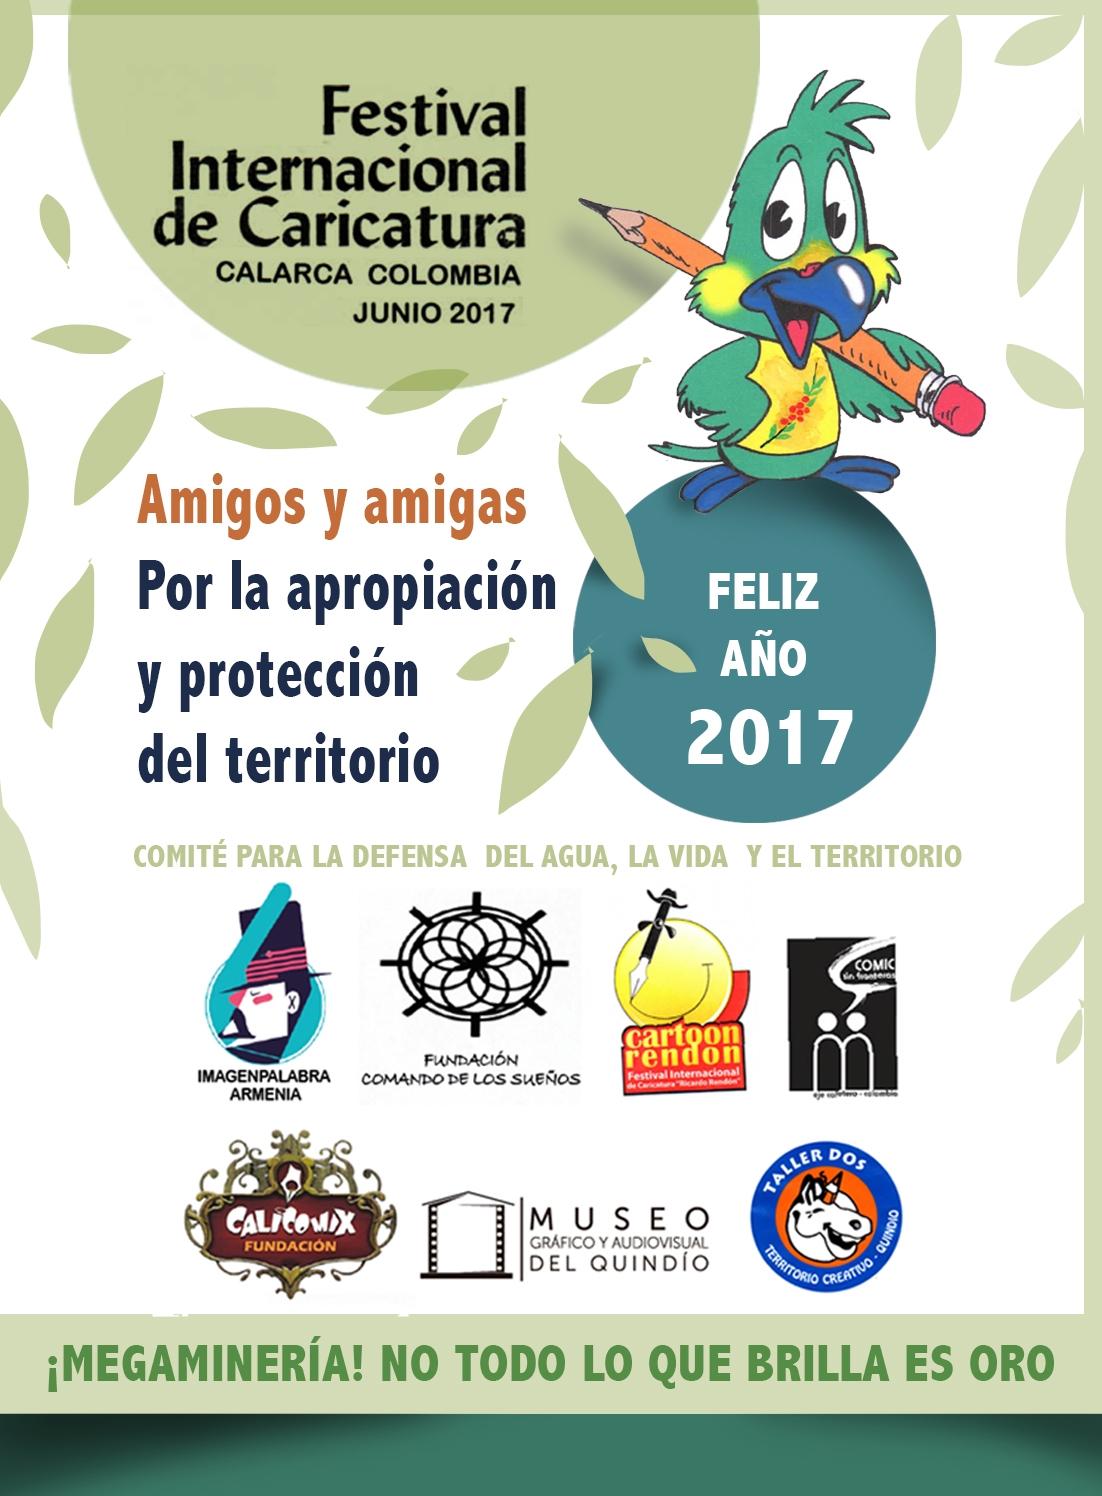 FESTIVAL INTERNACIONAL DE CARICATURA CALARCÁ 02ed4d8100c